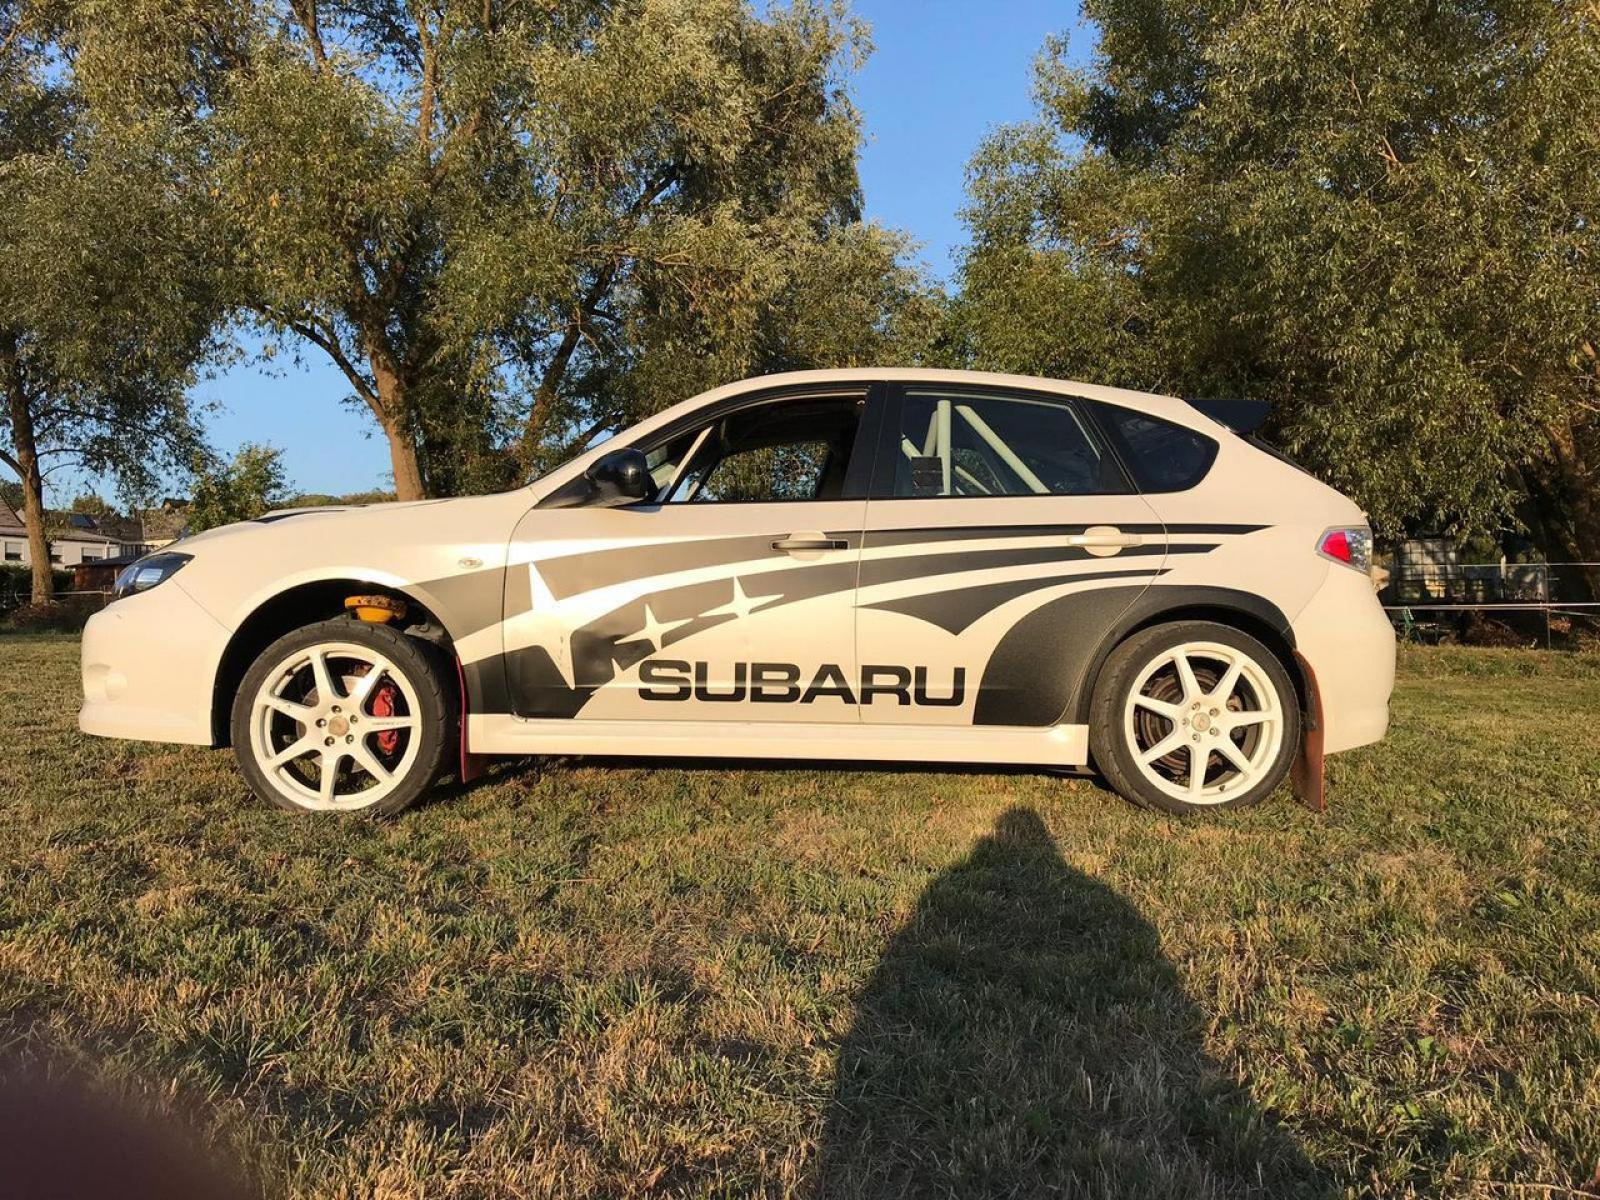 Subaru Impreza Wrx Sti 2009 - 2